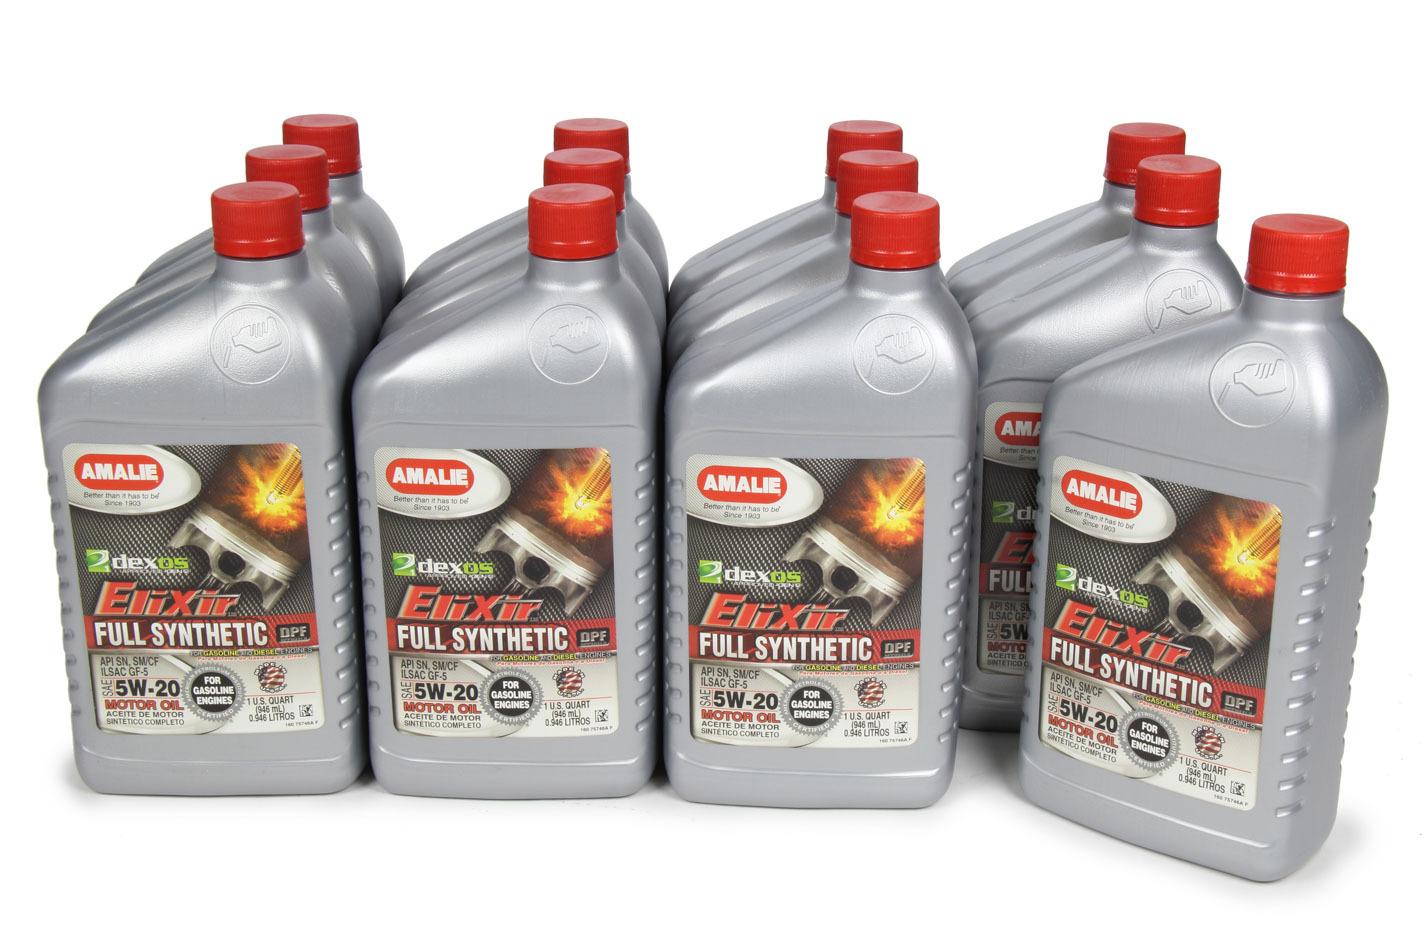 Amalie Elixir Full Synthetic 5w20 Dexos1 Case 12x1 Qt